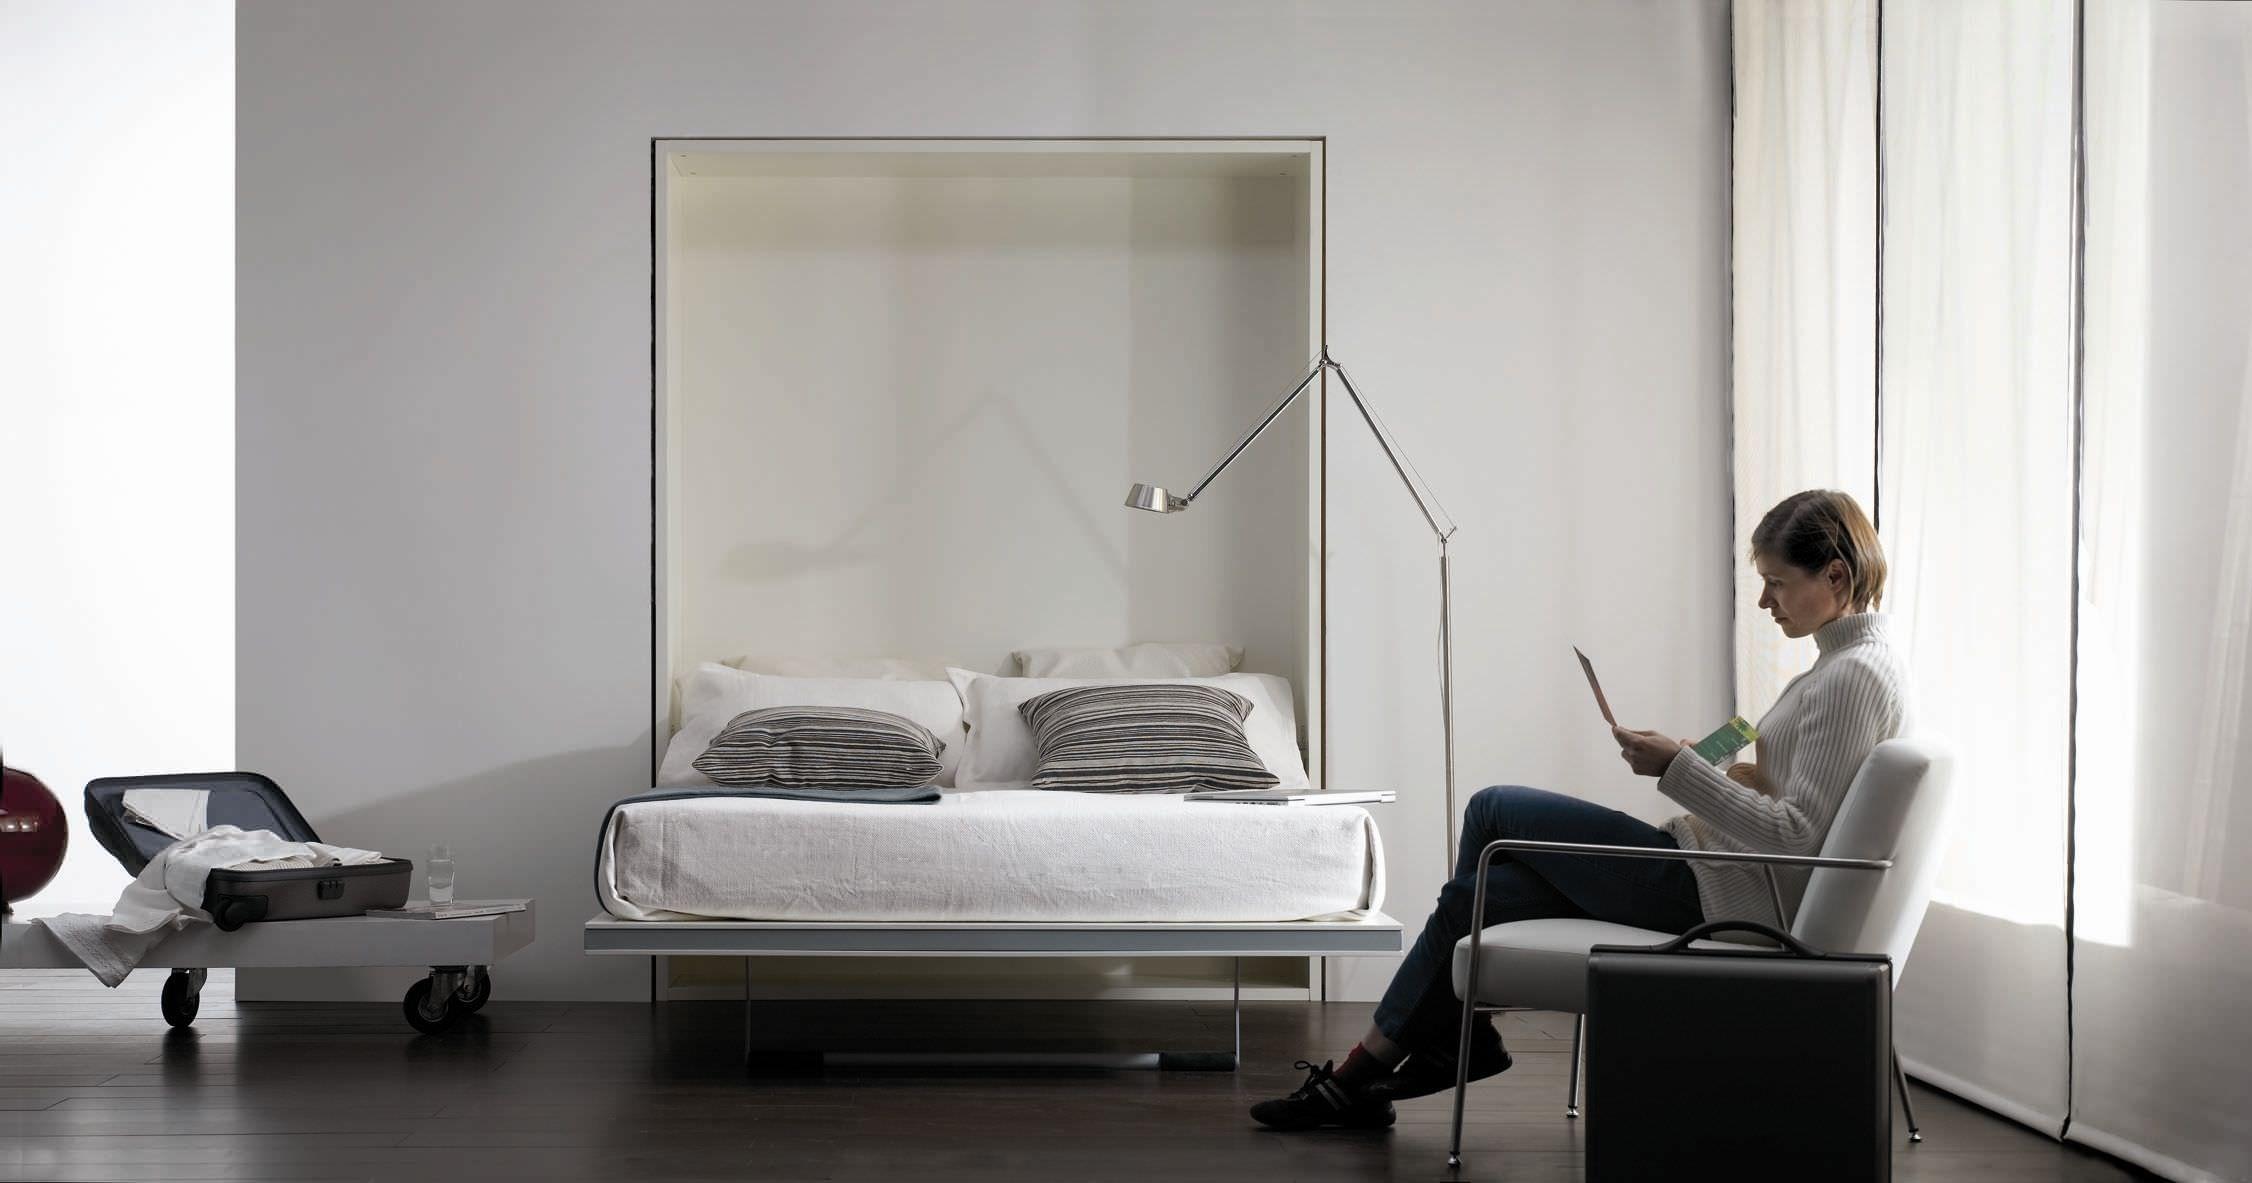 A Wonderful Design Furniture Of Murphy Bunk Beds Wall Beds